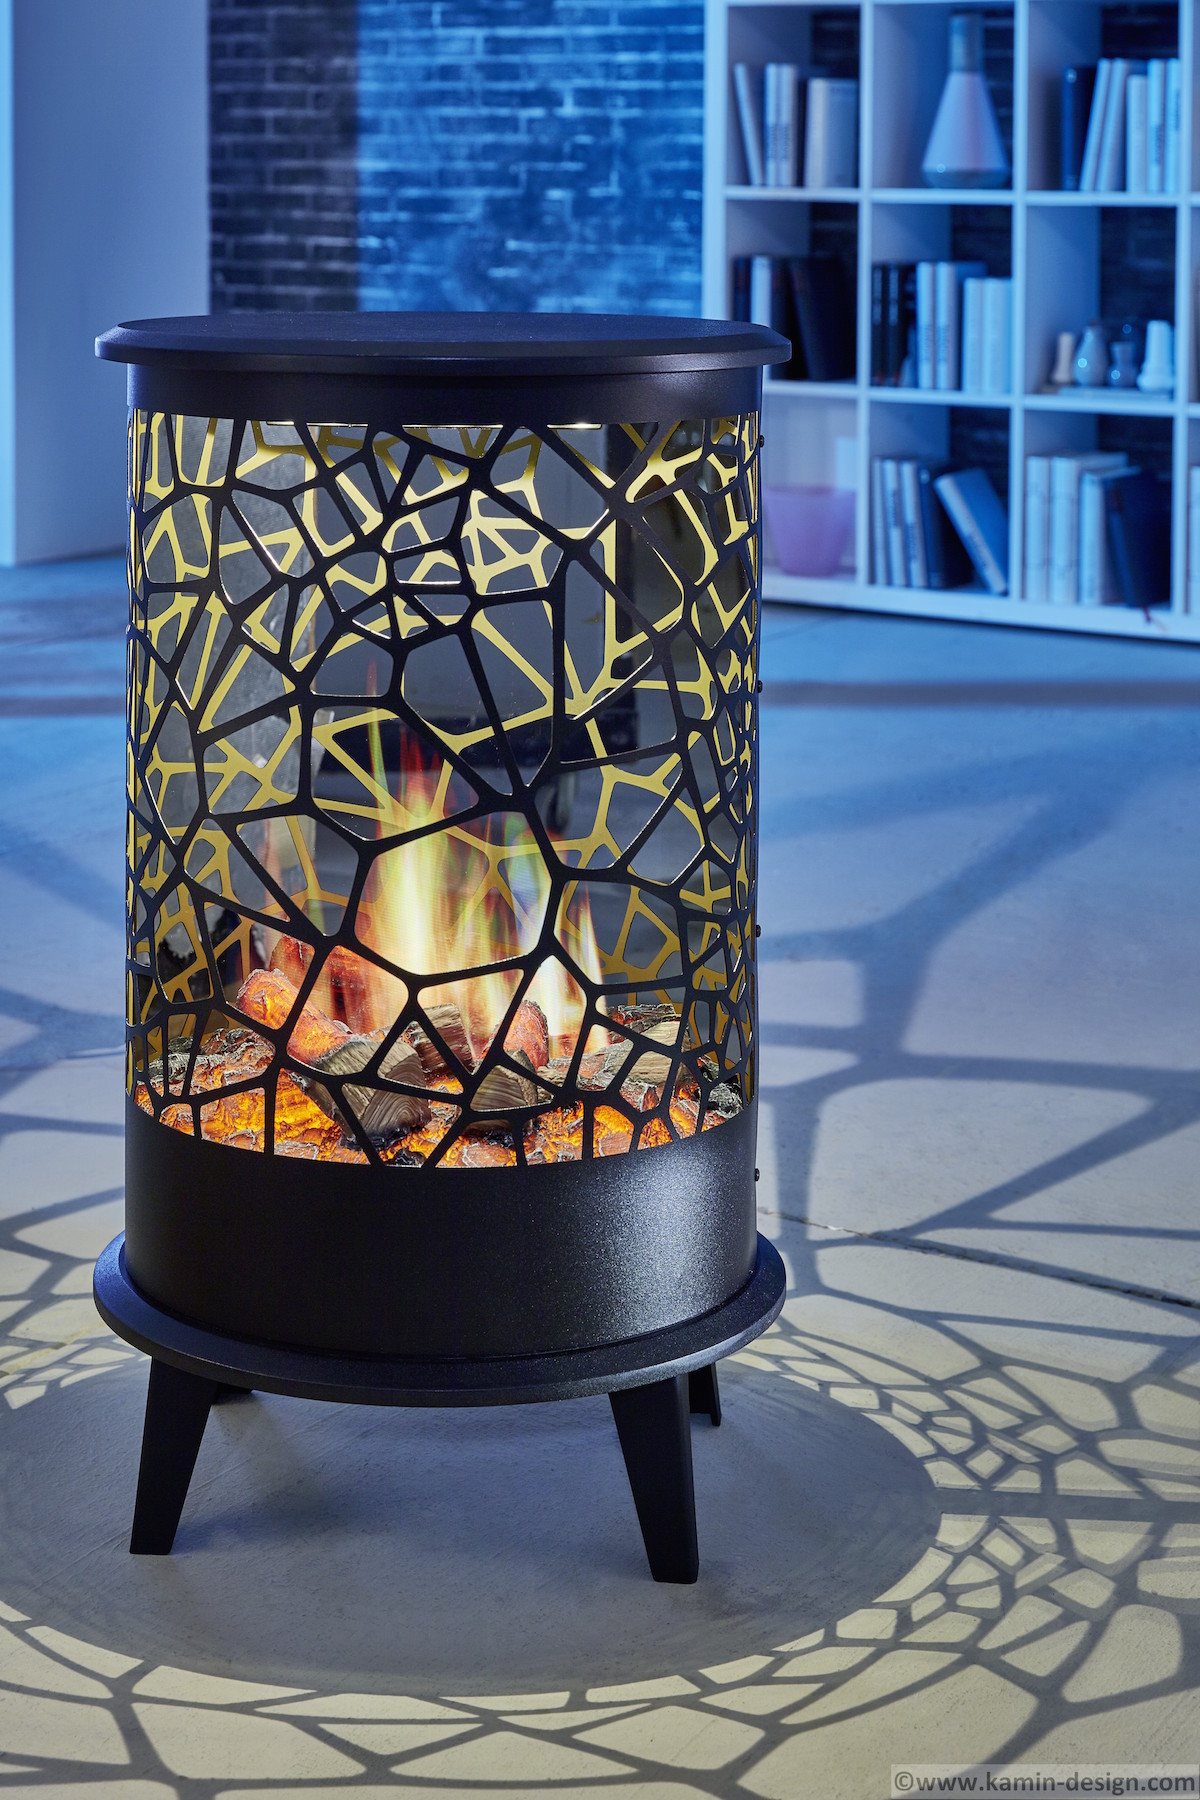 vulcano one effektfeuer opti v 360 kamin. Black Bedroom Furniture Sets. Home Design Ideas